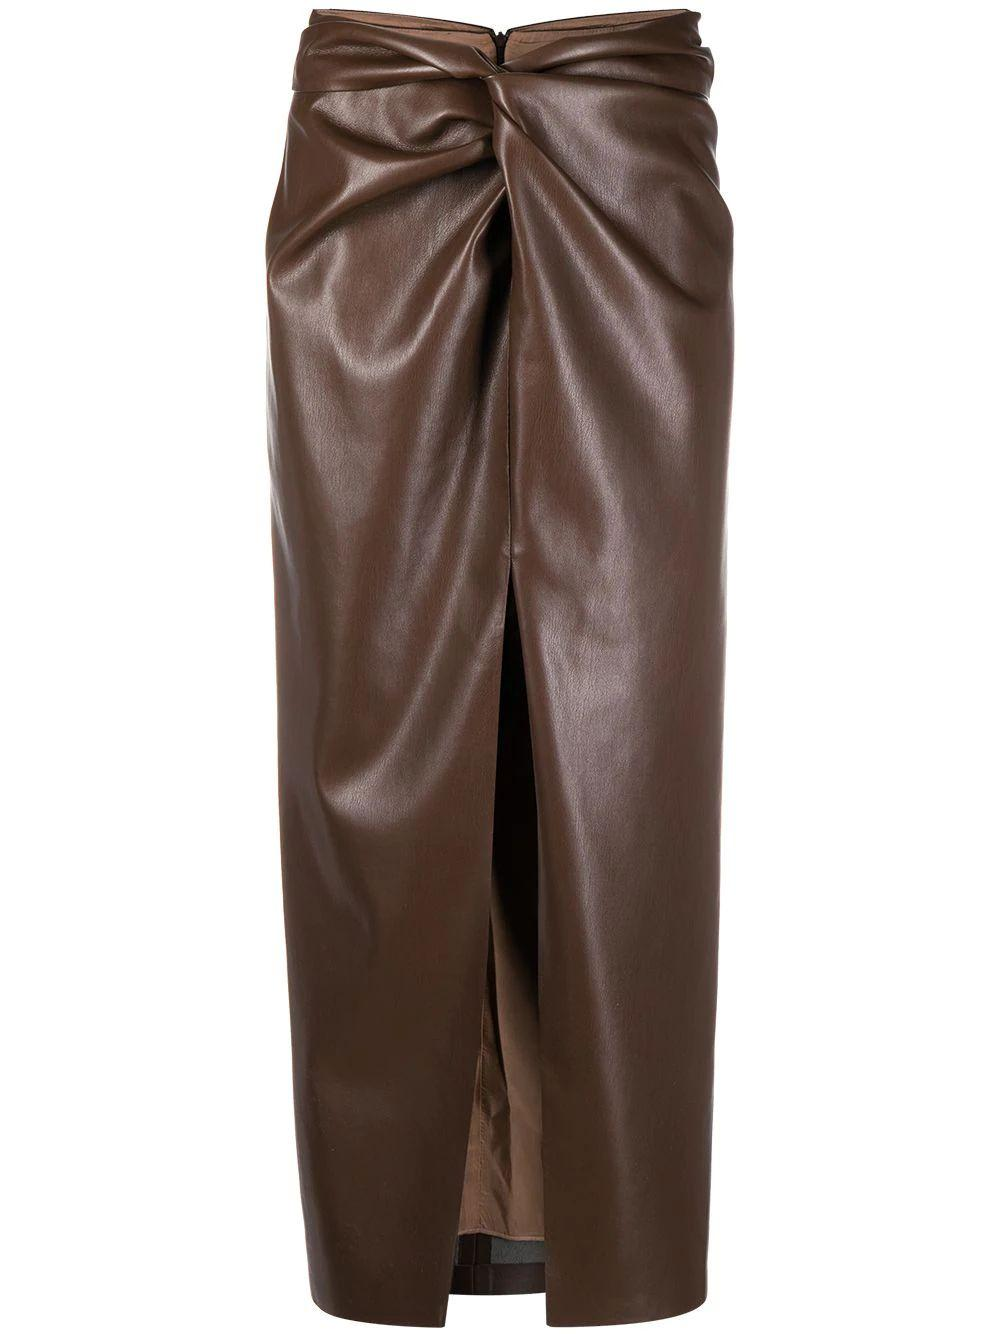 Inci Vegan Leather Skirt Item # NW21PFSK00478